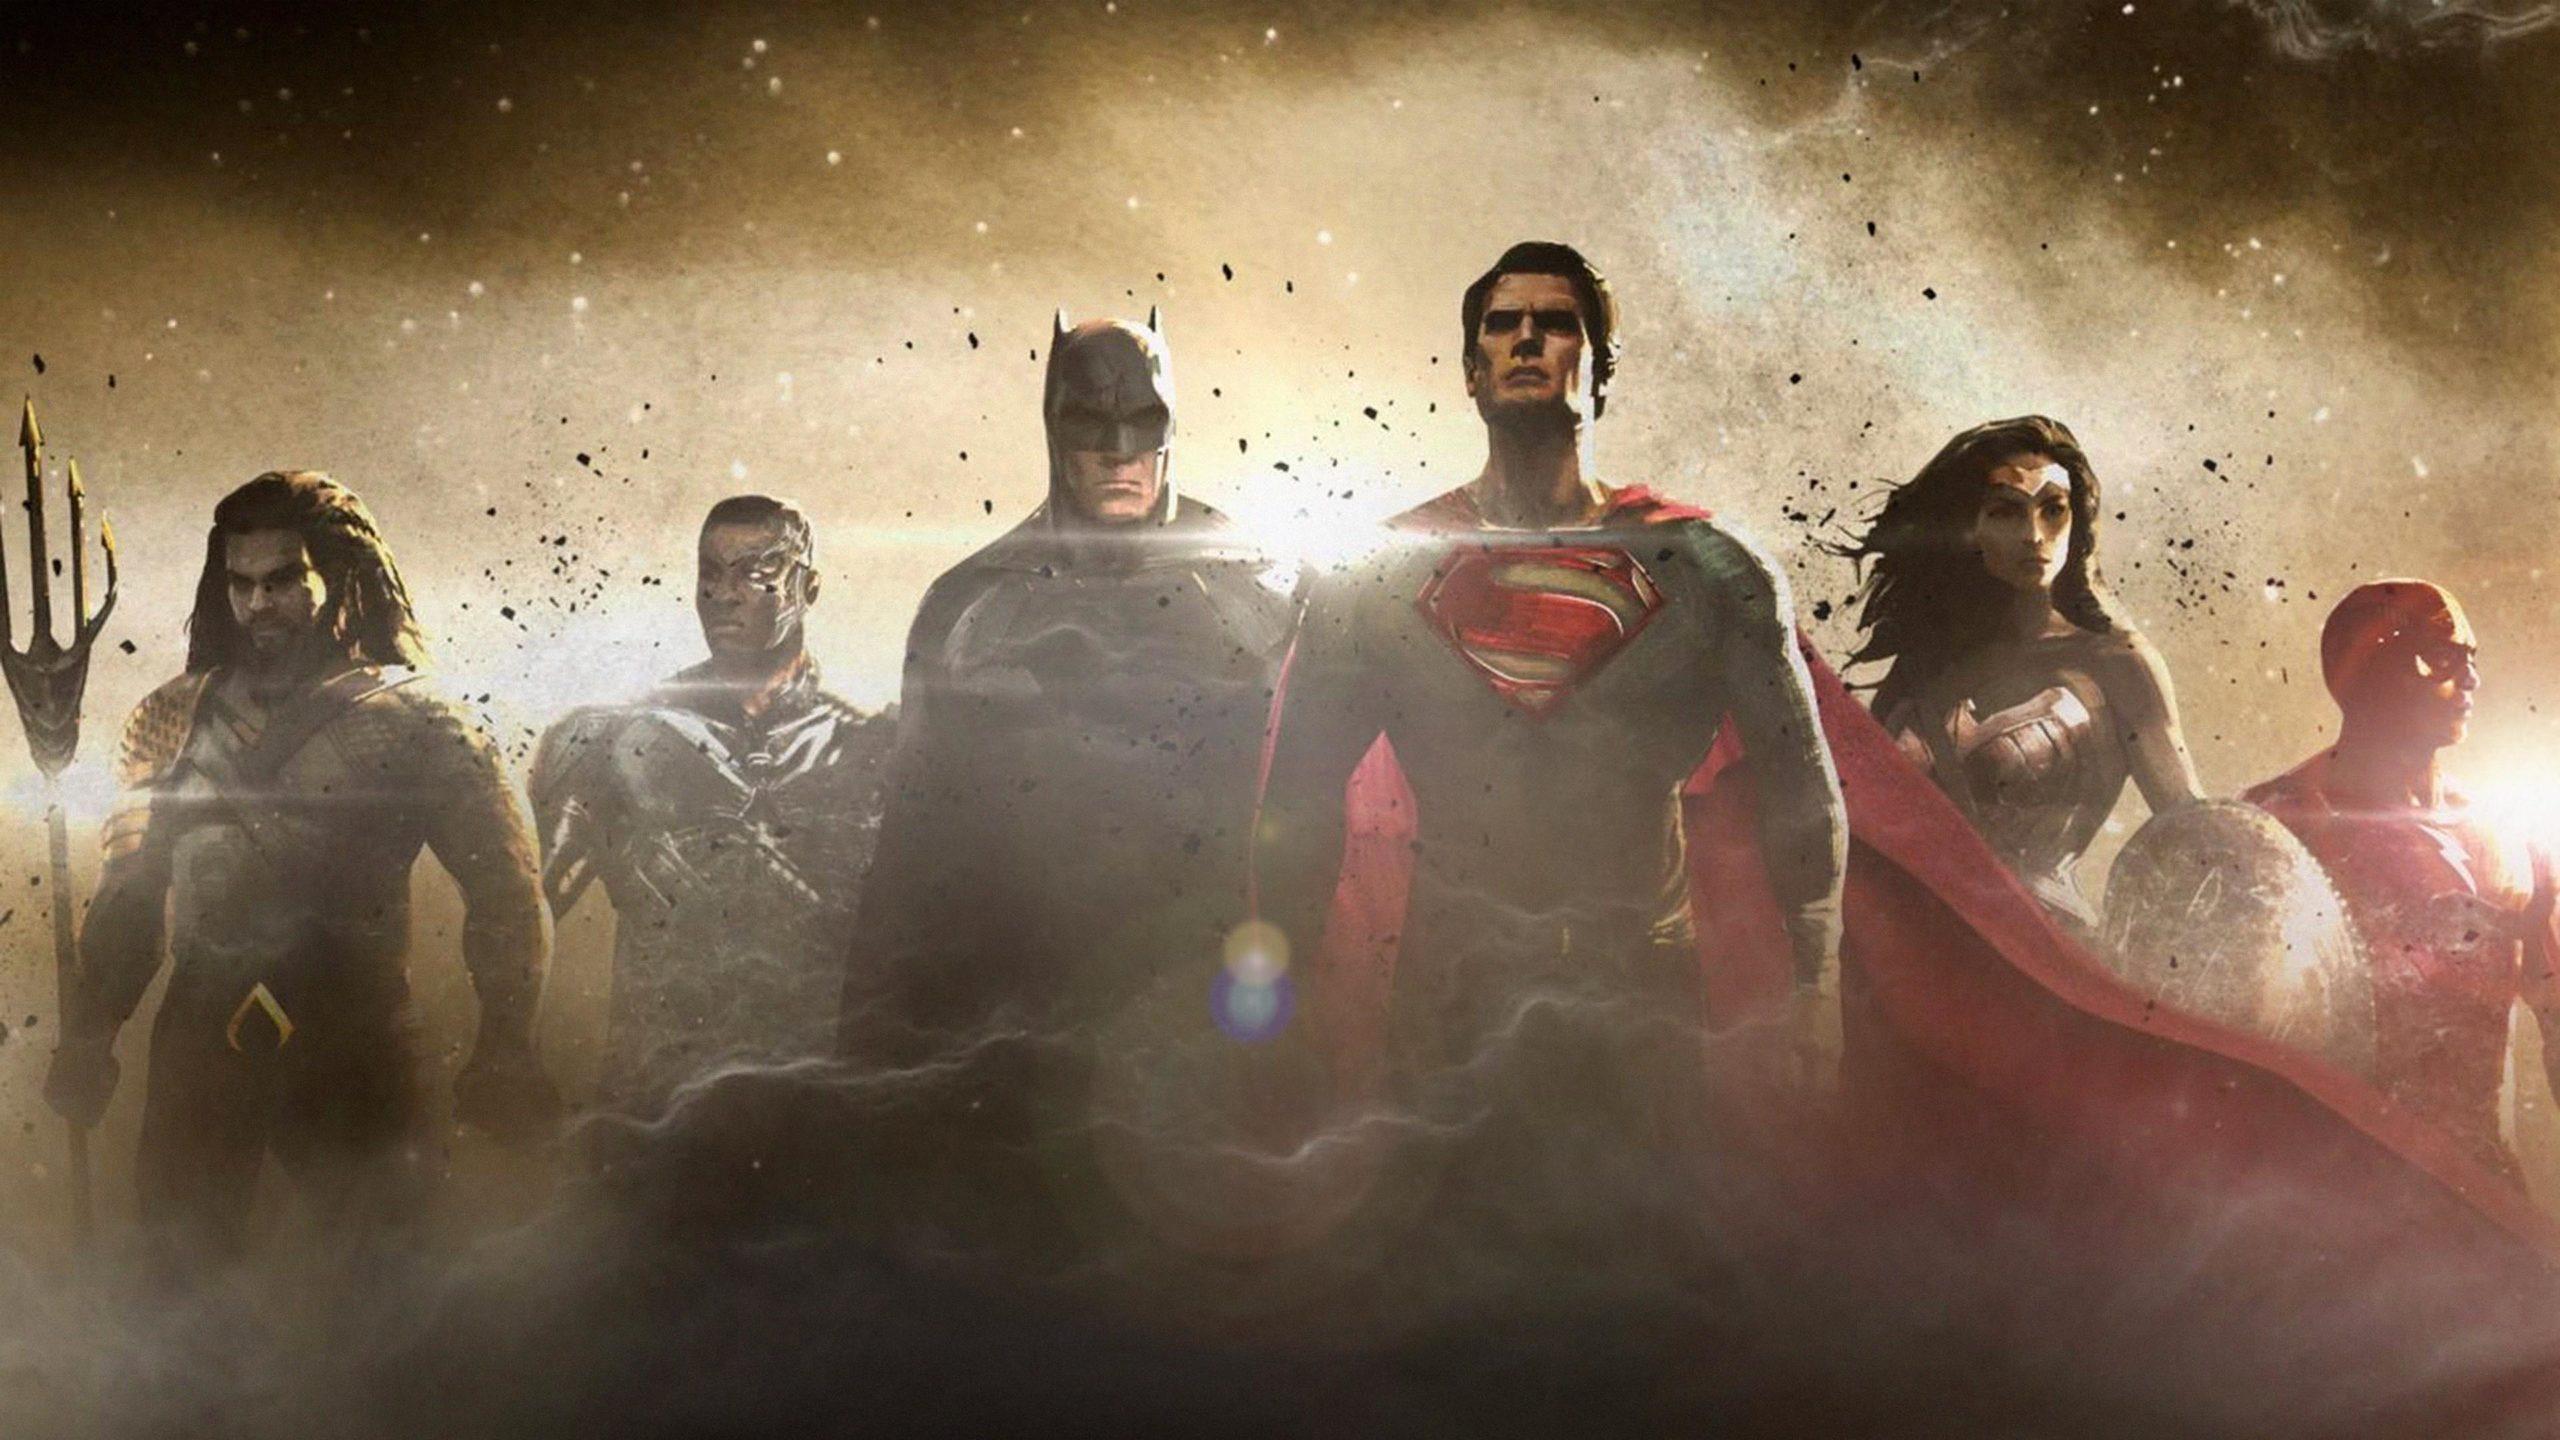 justice league of america wallpaper